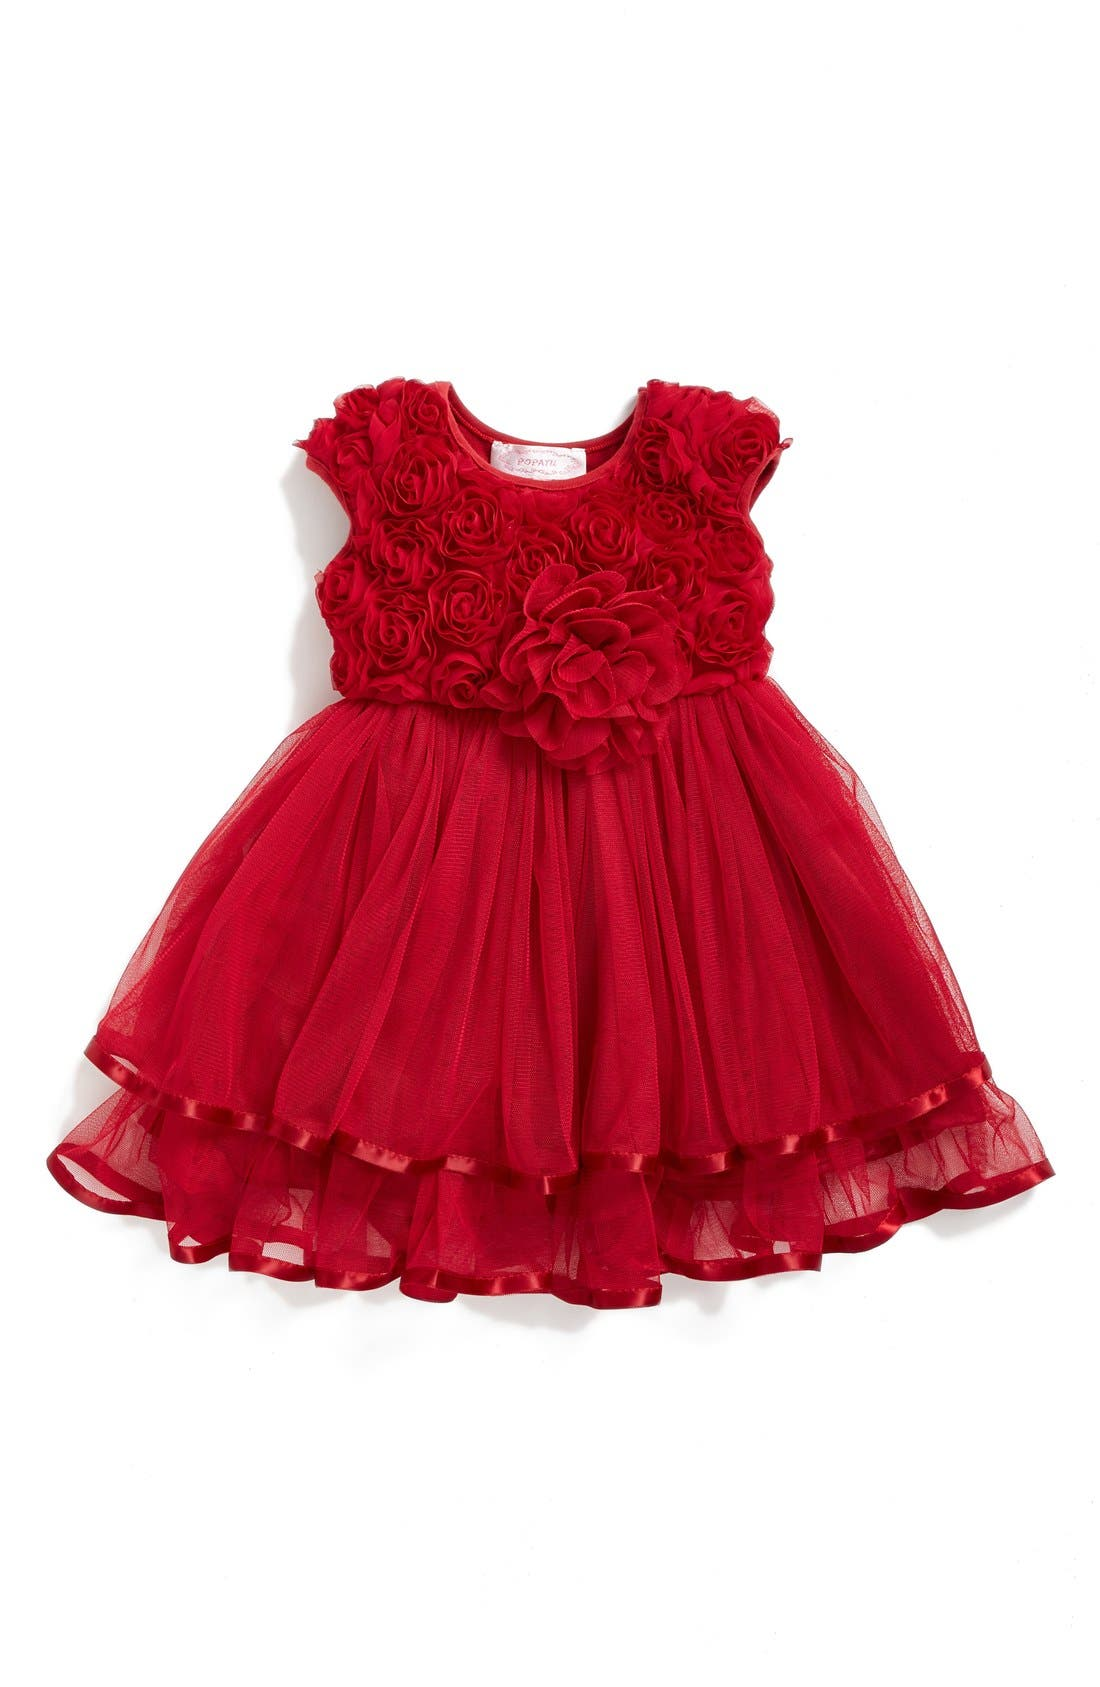 Rosette Tulle Dress,                             Main thumbnail 1, color,                             Red